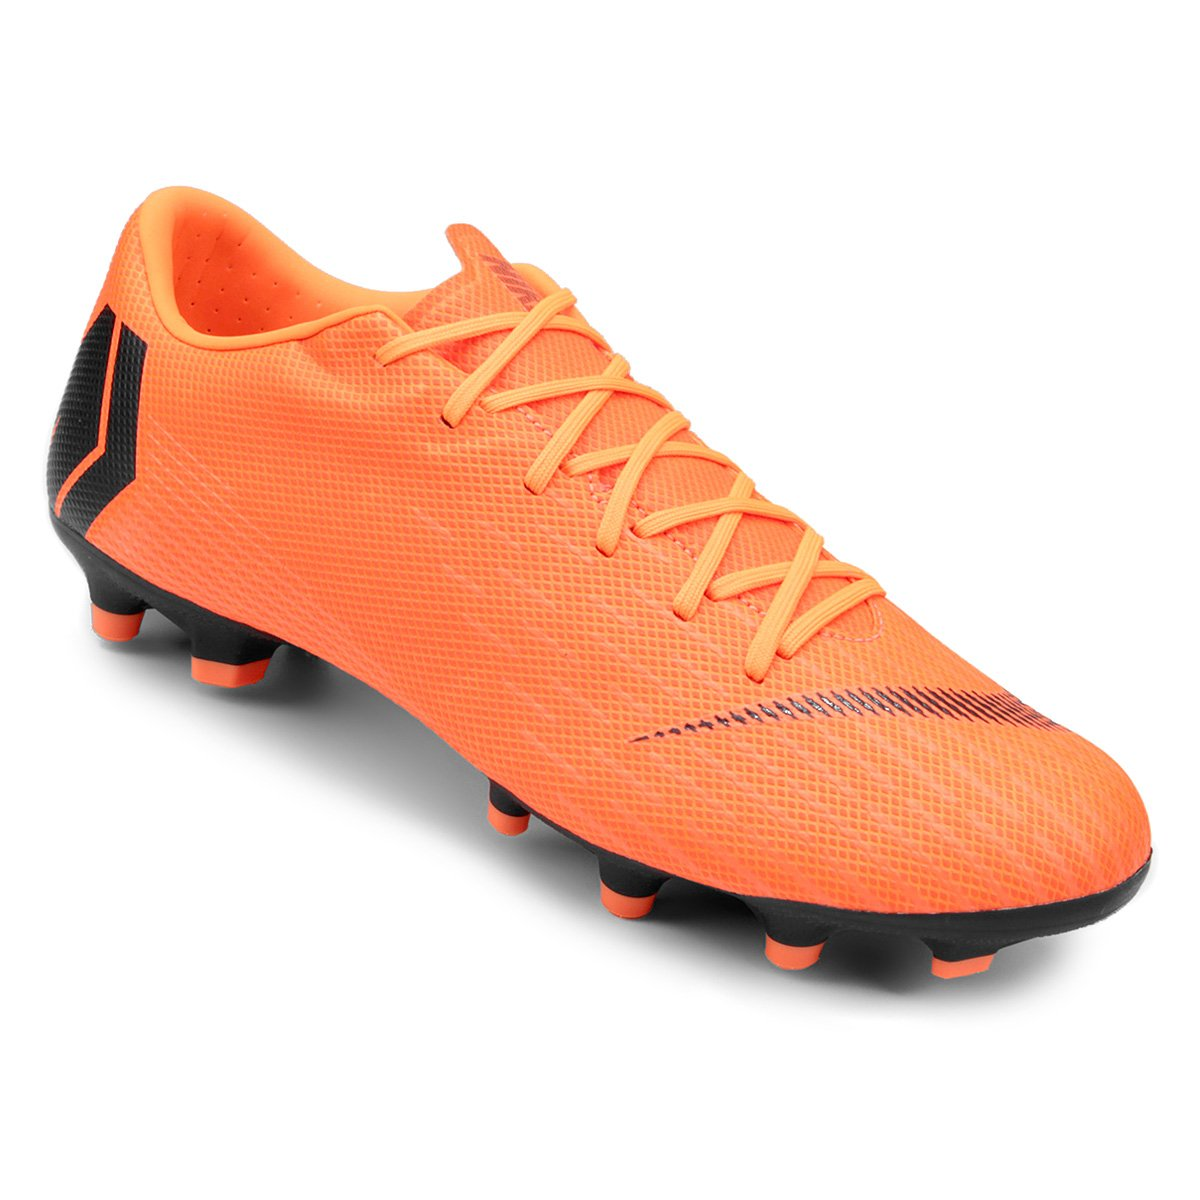 Chuteira e Preto Nike Campo Laranja Academy Mercurial Vapor 12 Masculina R68grw6xFq